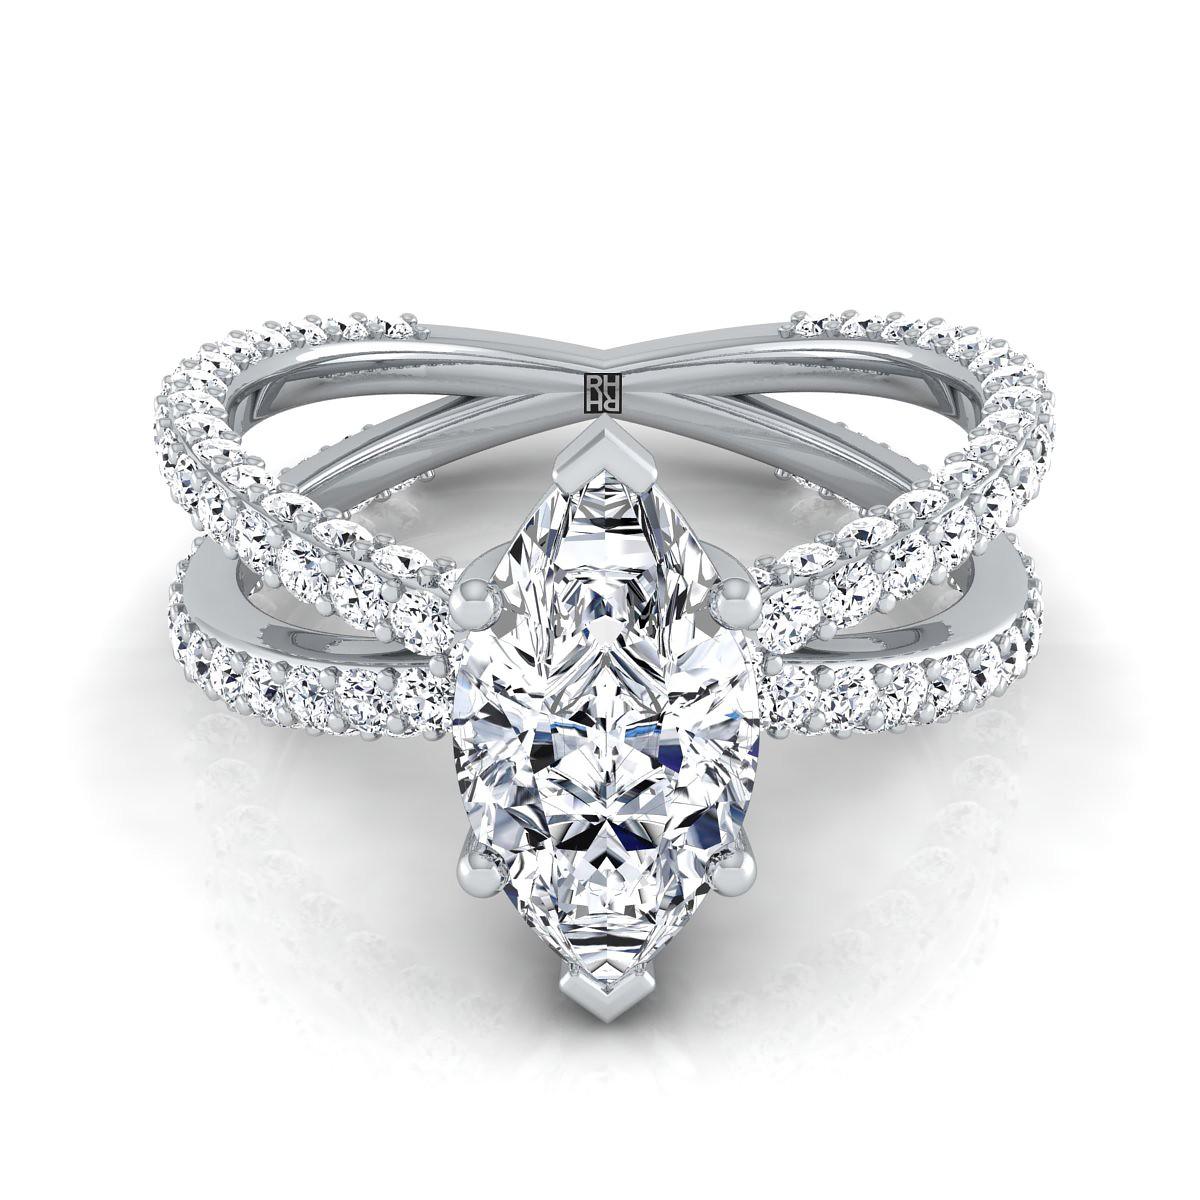 Milgrain Marquise and Dot Diamond Ring in 14k   Blue Nile